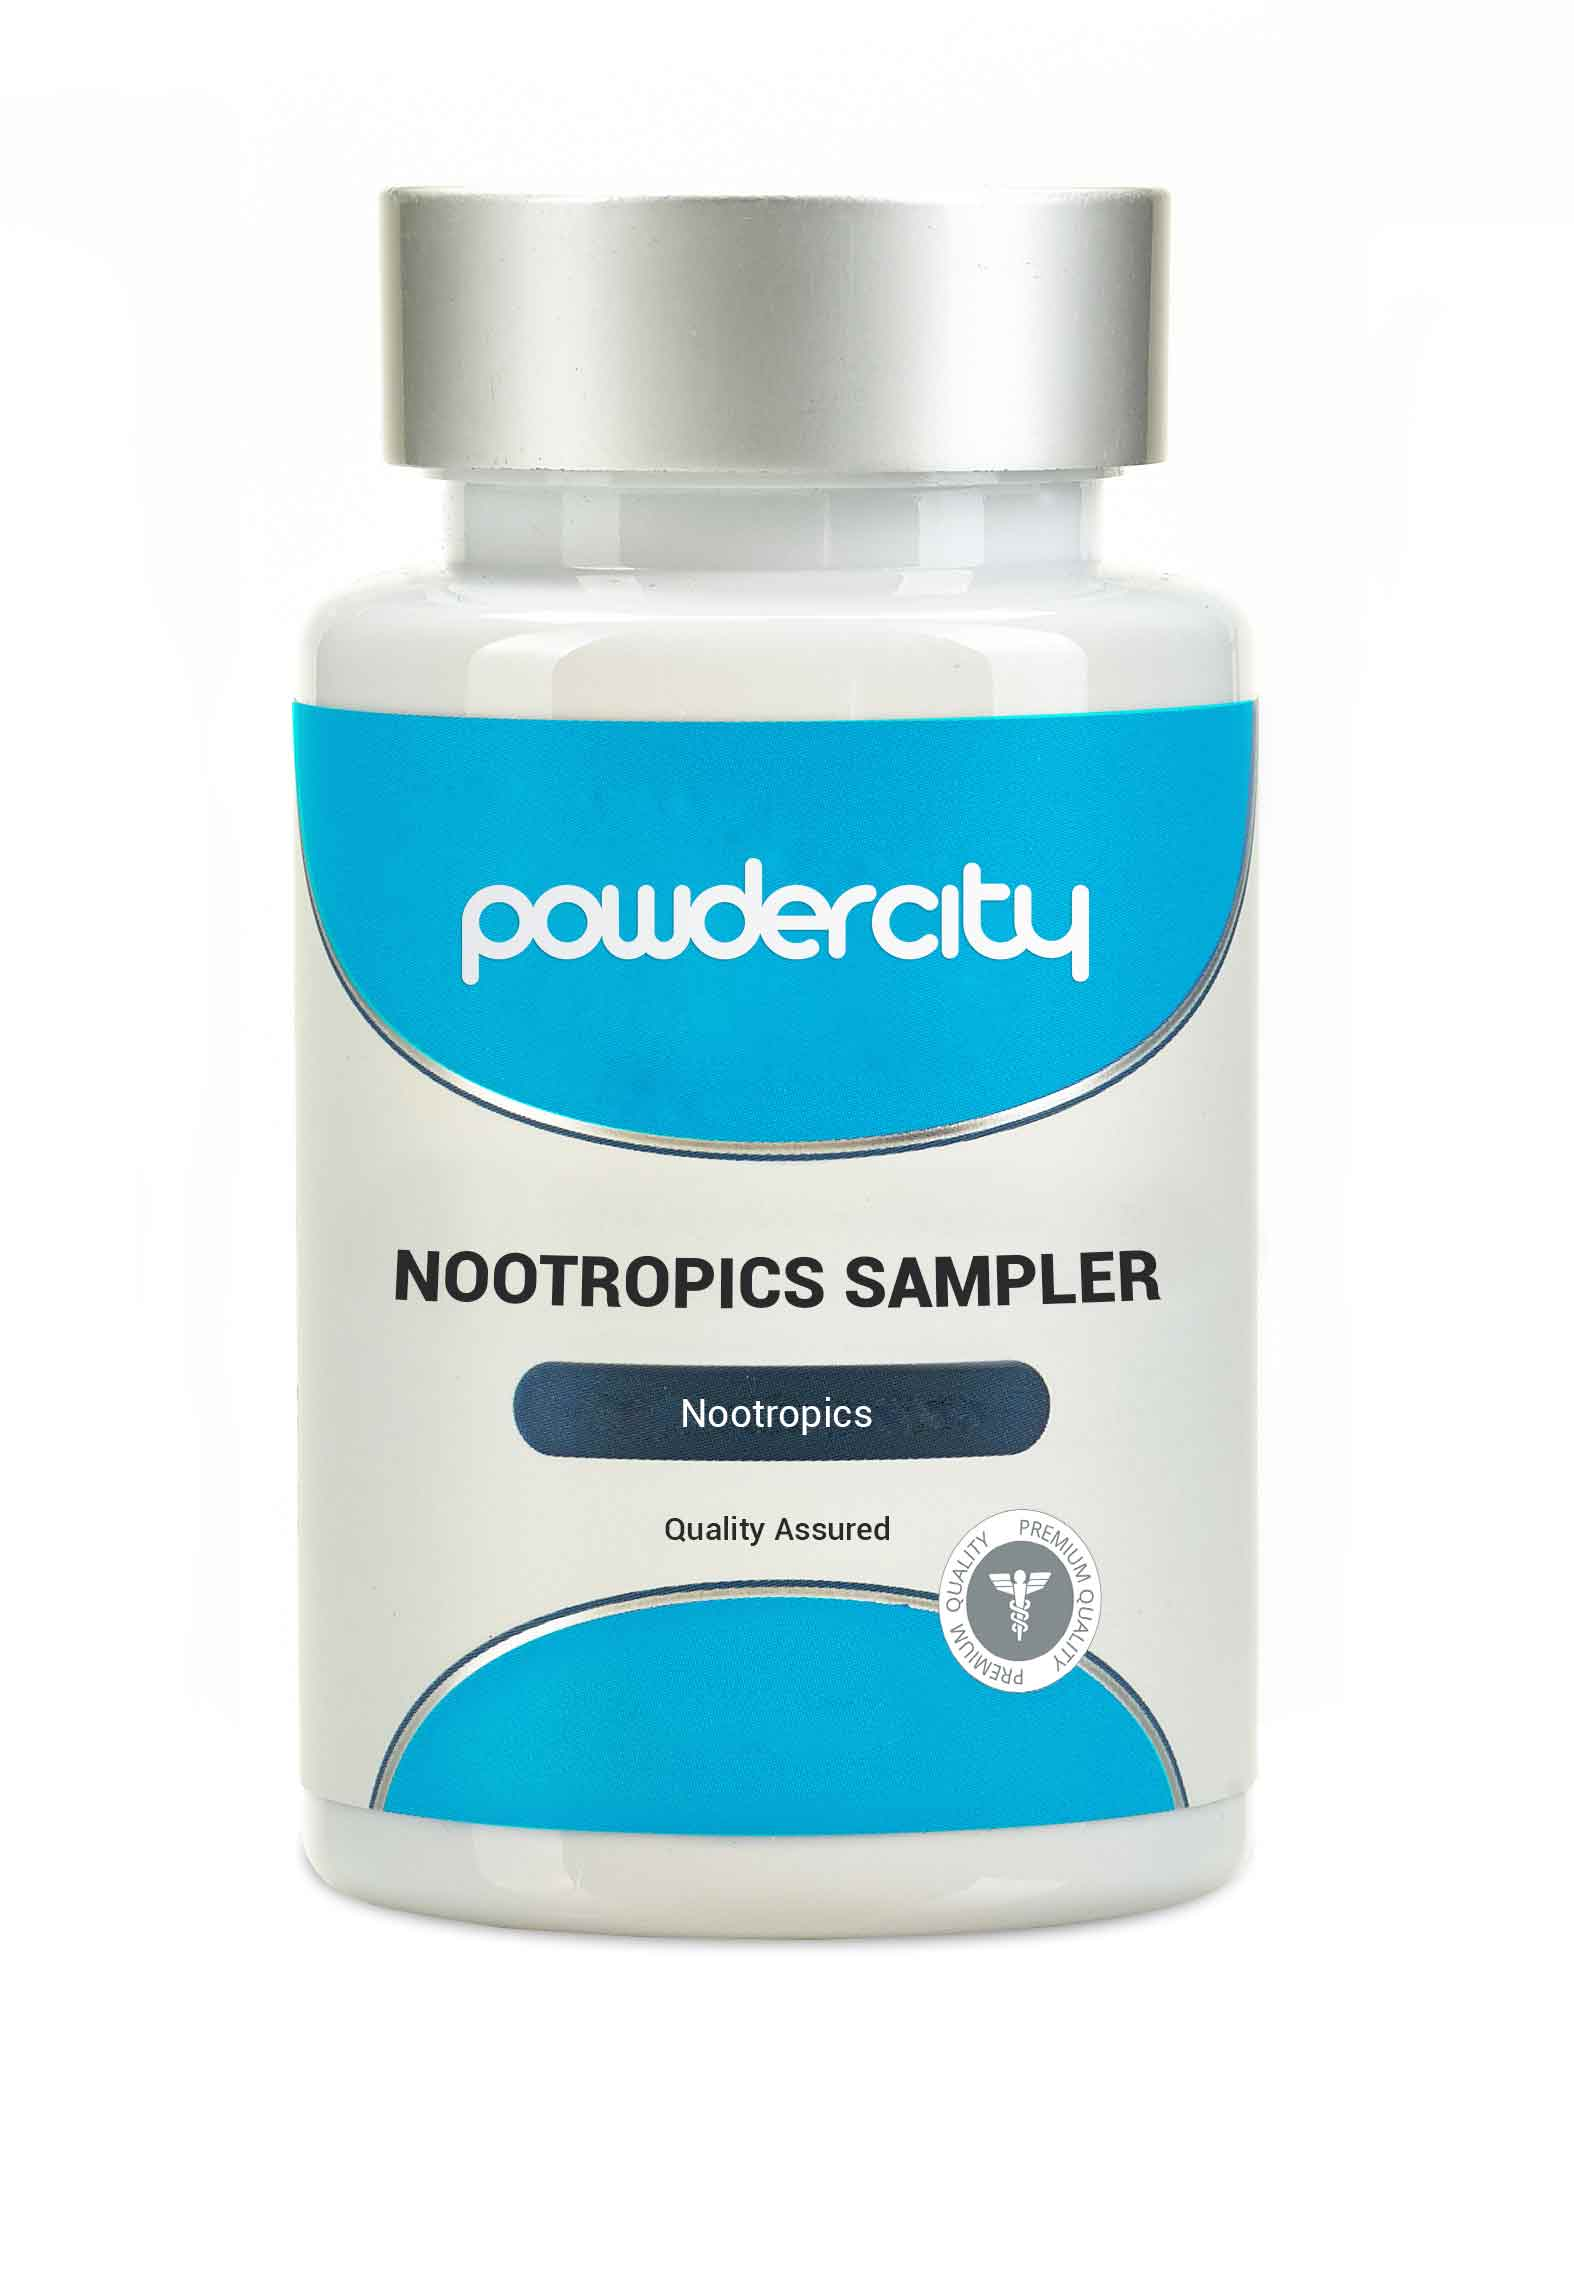 Nootropics Sampler - Noopept, Pramiracetam, Aniracetam, Oxiracetam